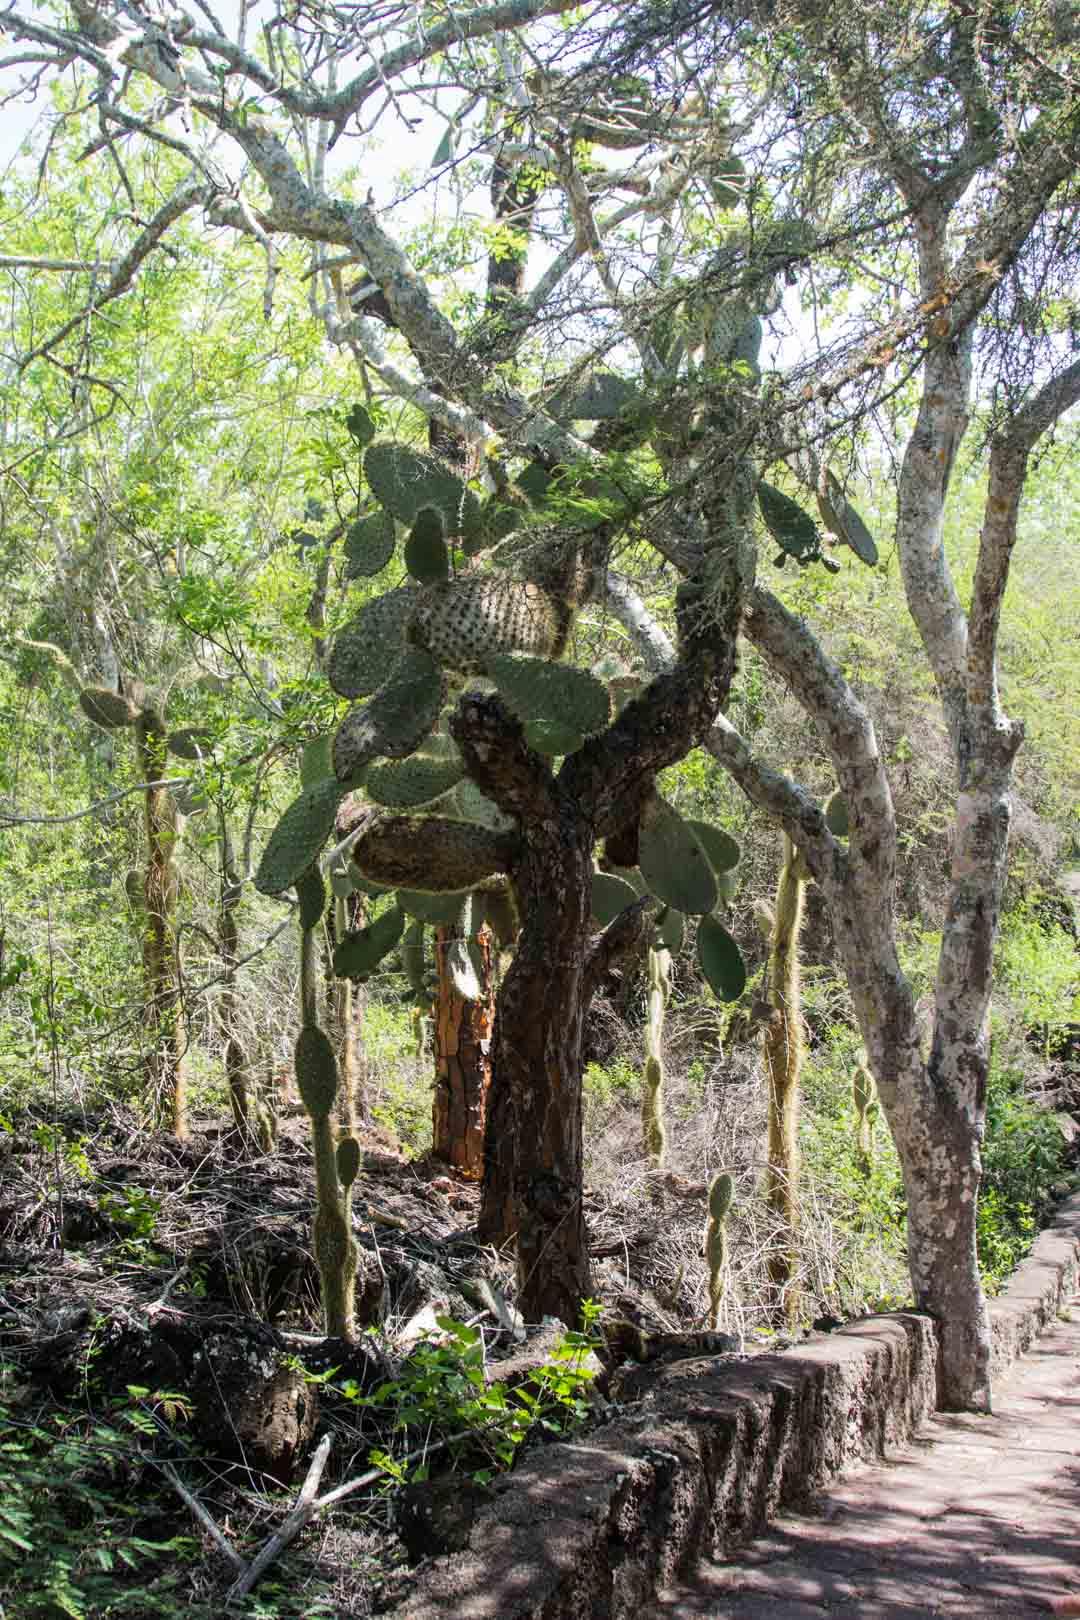 kaktus Galapagossaarilla